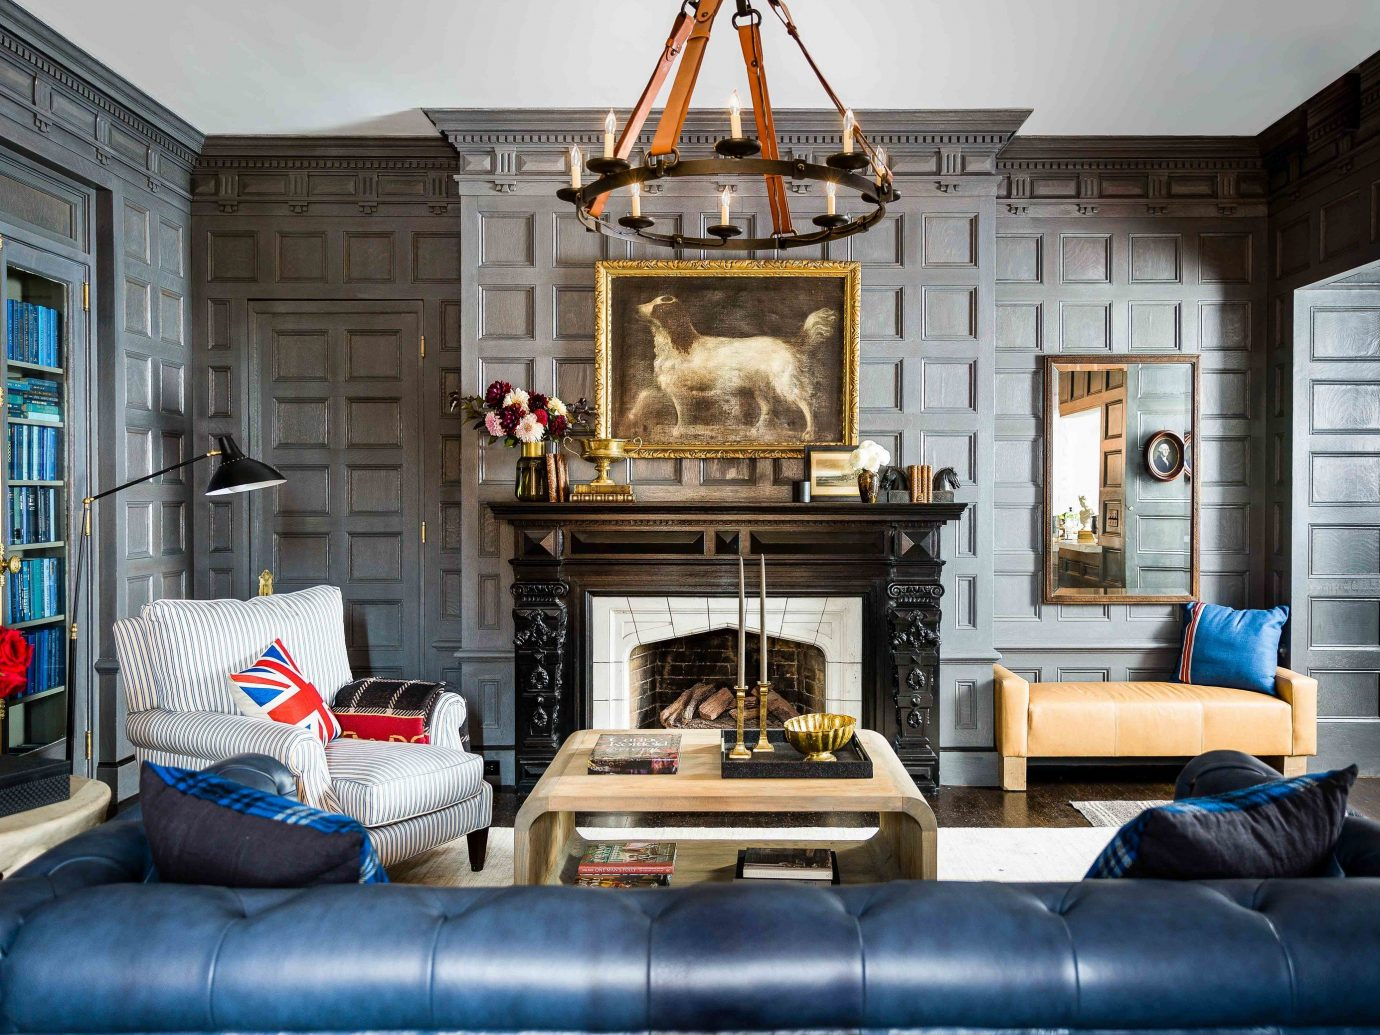 Boutique Hotels Hotels Influencers + Tastemakers Romantic Hotels Style + Design living room room interior design home furniture